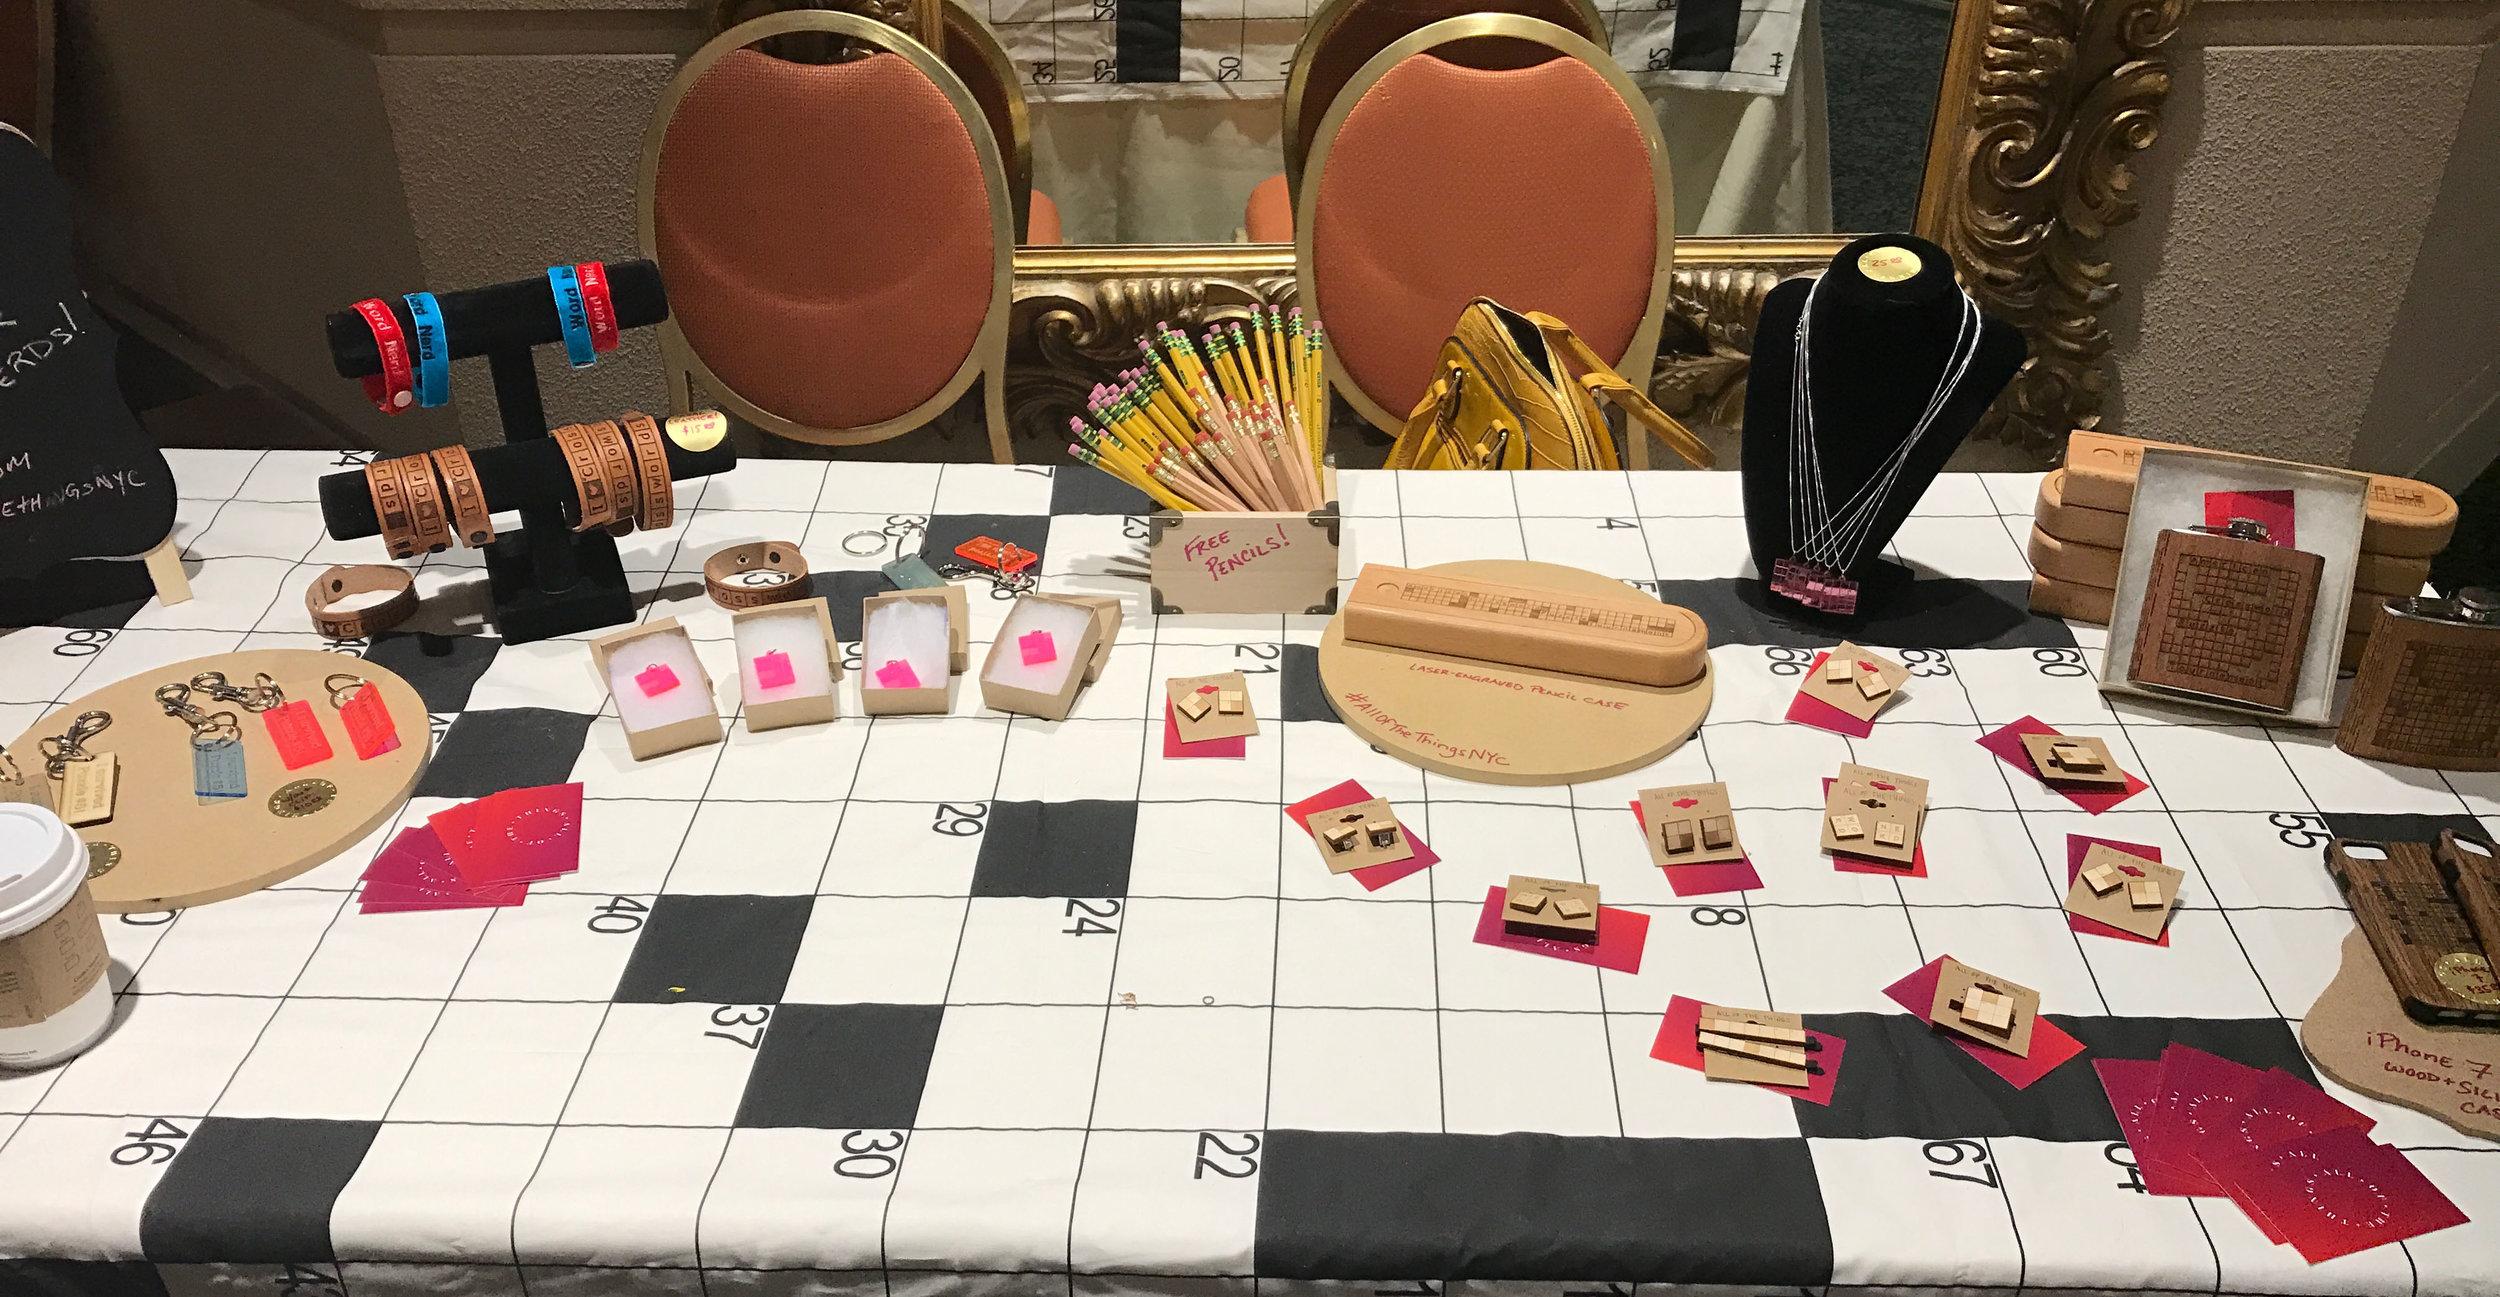 The American Crossword Puzzle Tournament Pop-Up Shop